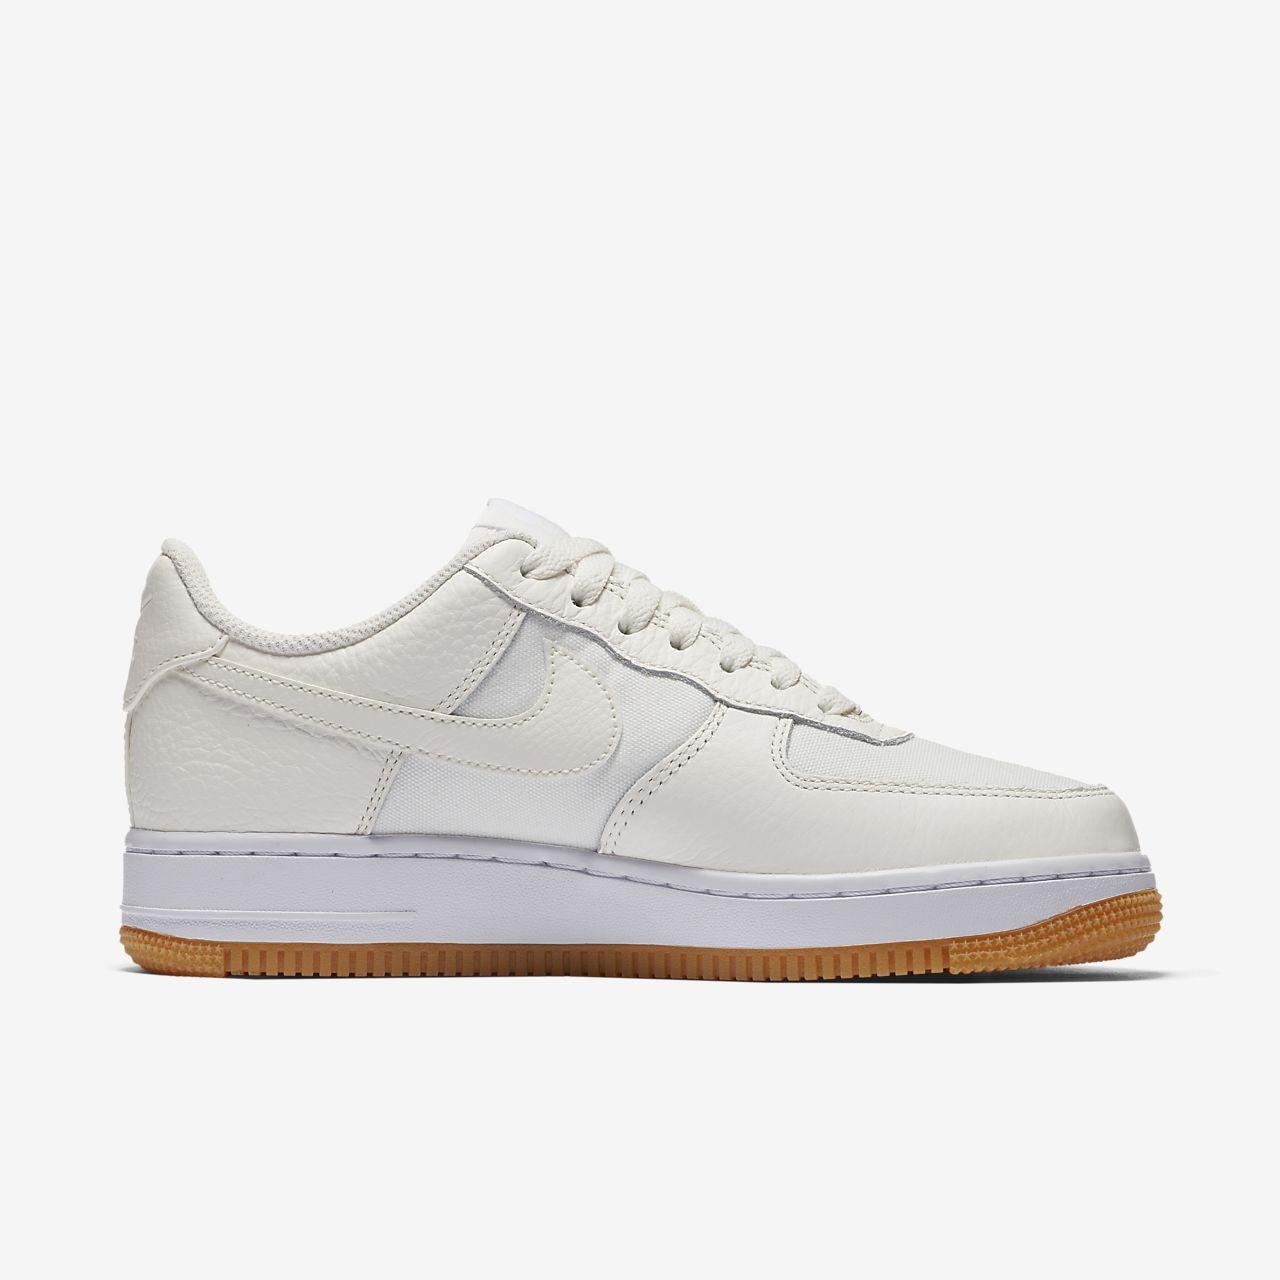 ... Chaussure Nike Air Force 1 '07 Low Premium pour Femme